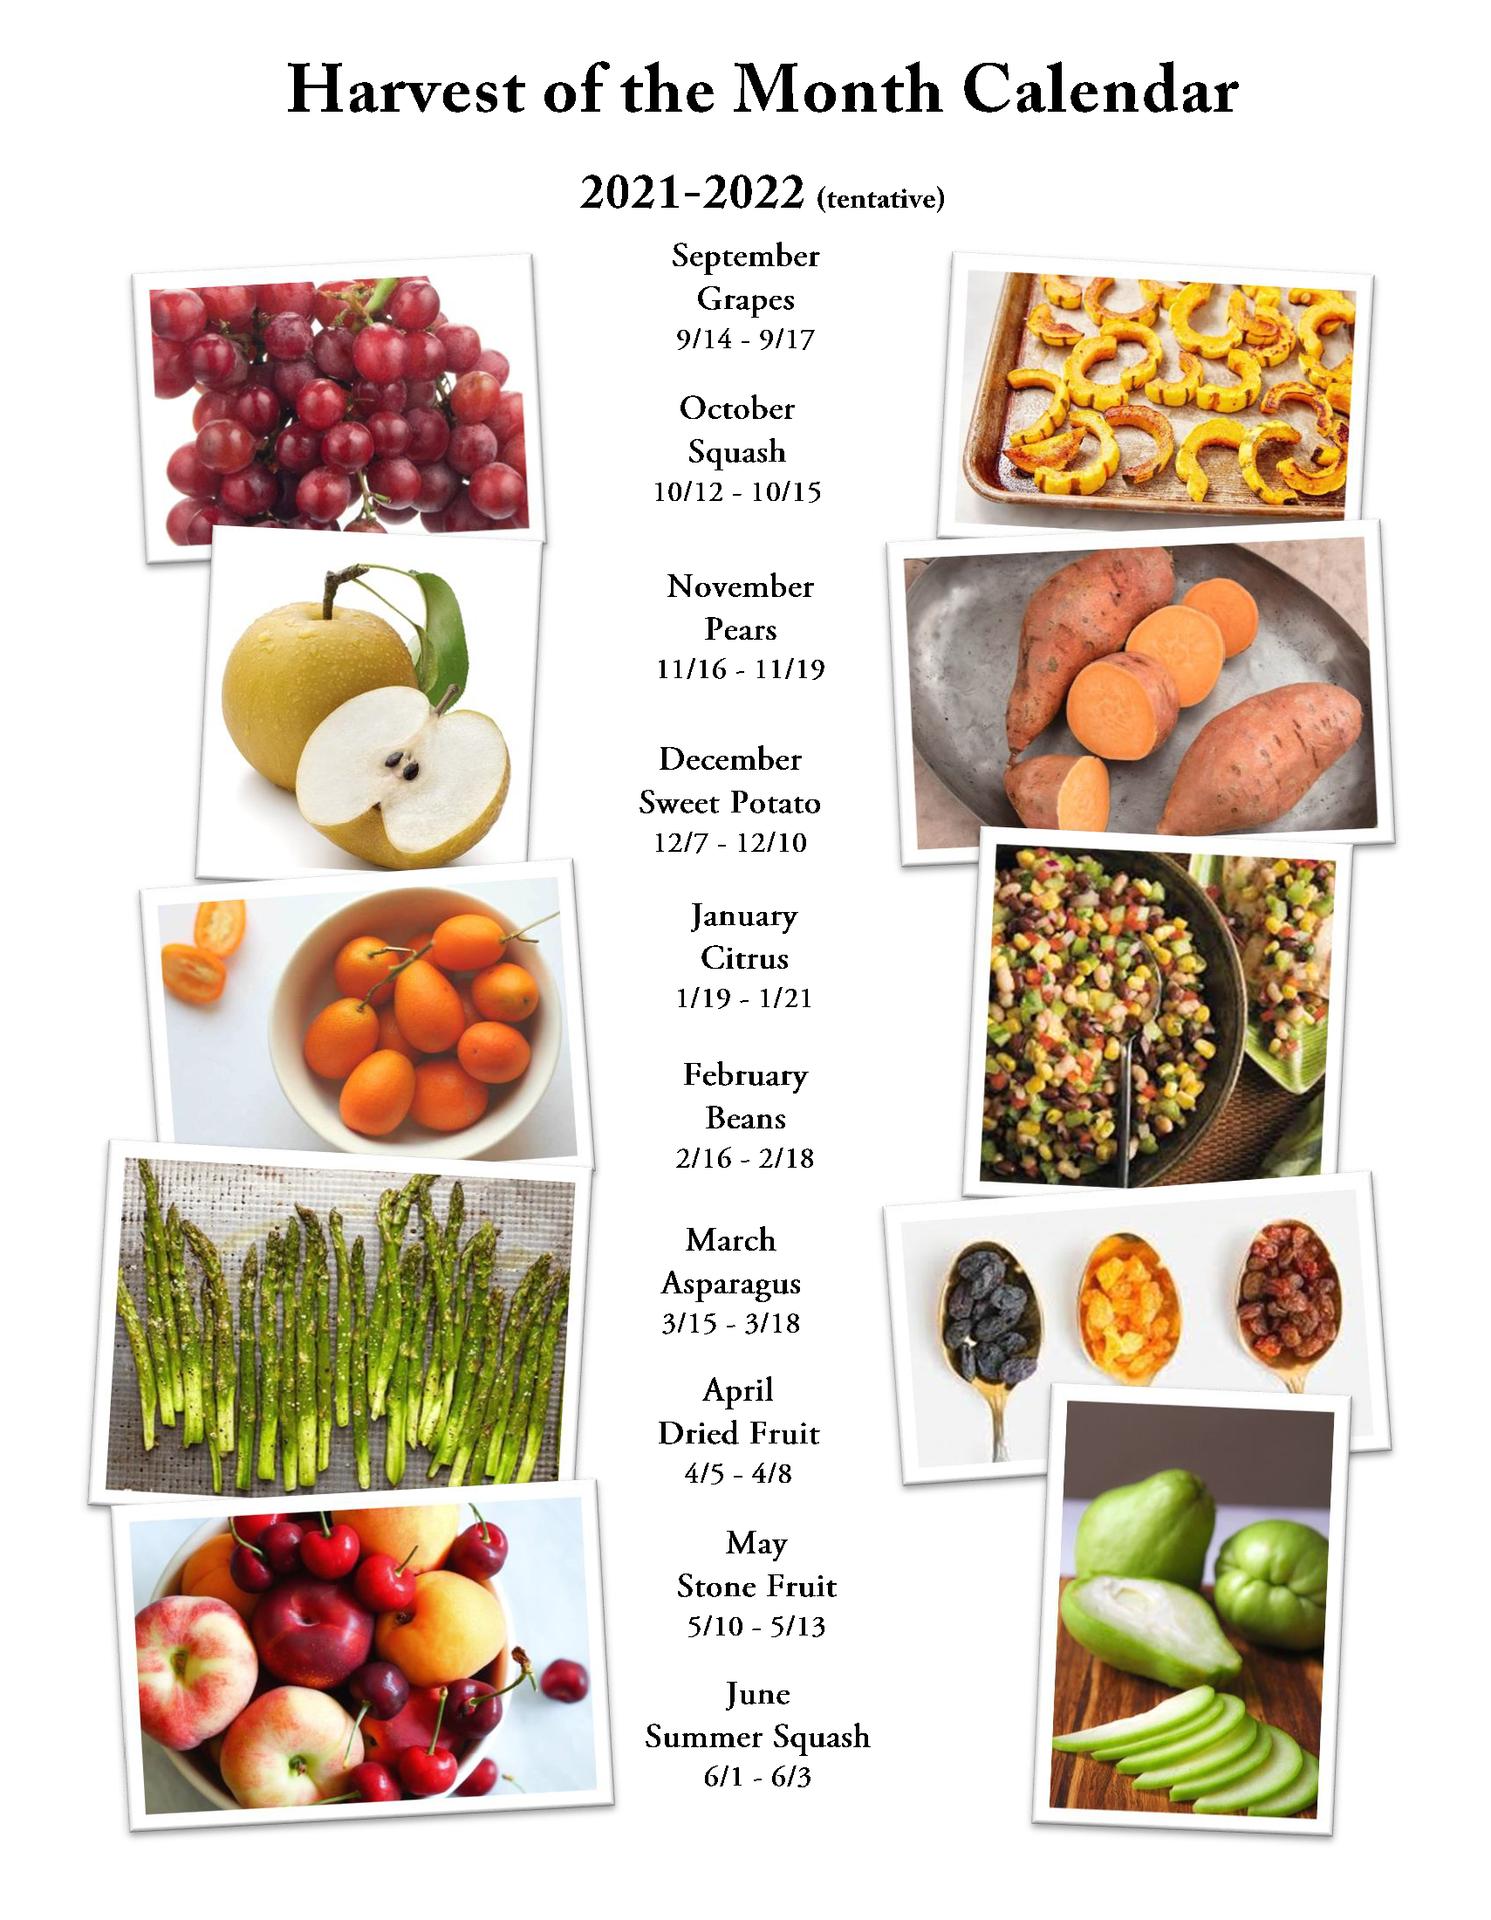 Harvest of the Month Calendar 2021-22